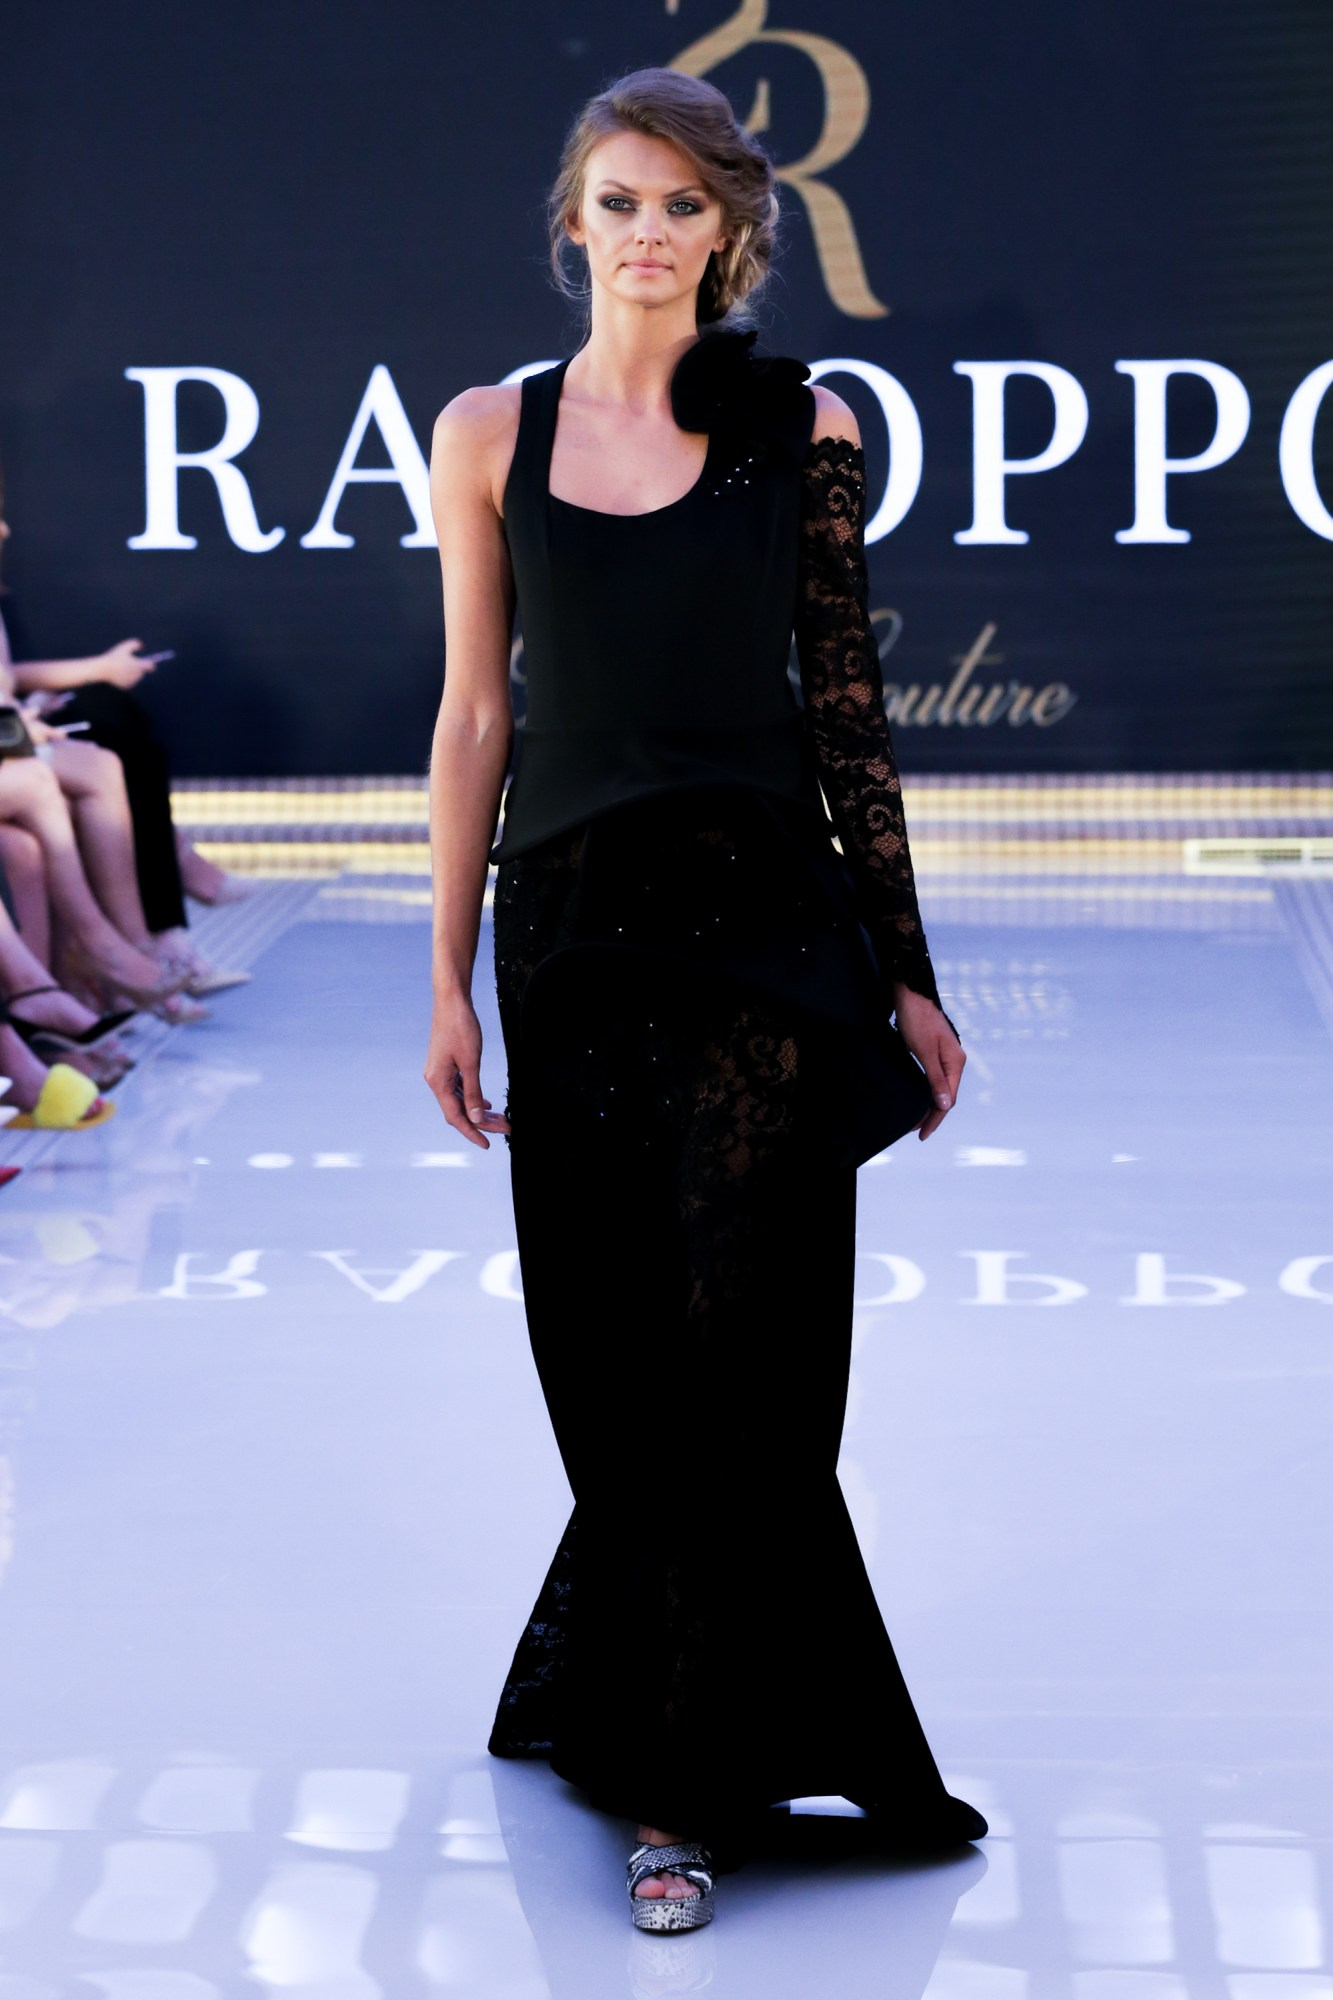 Simone RacioppoReady Couture Fall Winter 2018 CollectionDubai Fashion Week